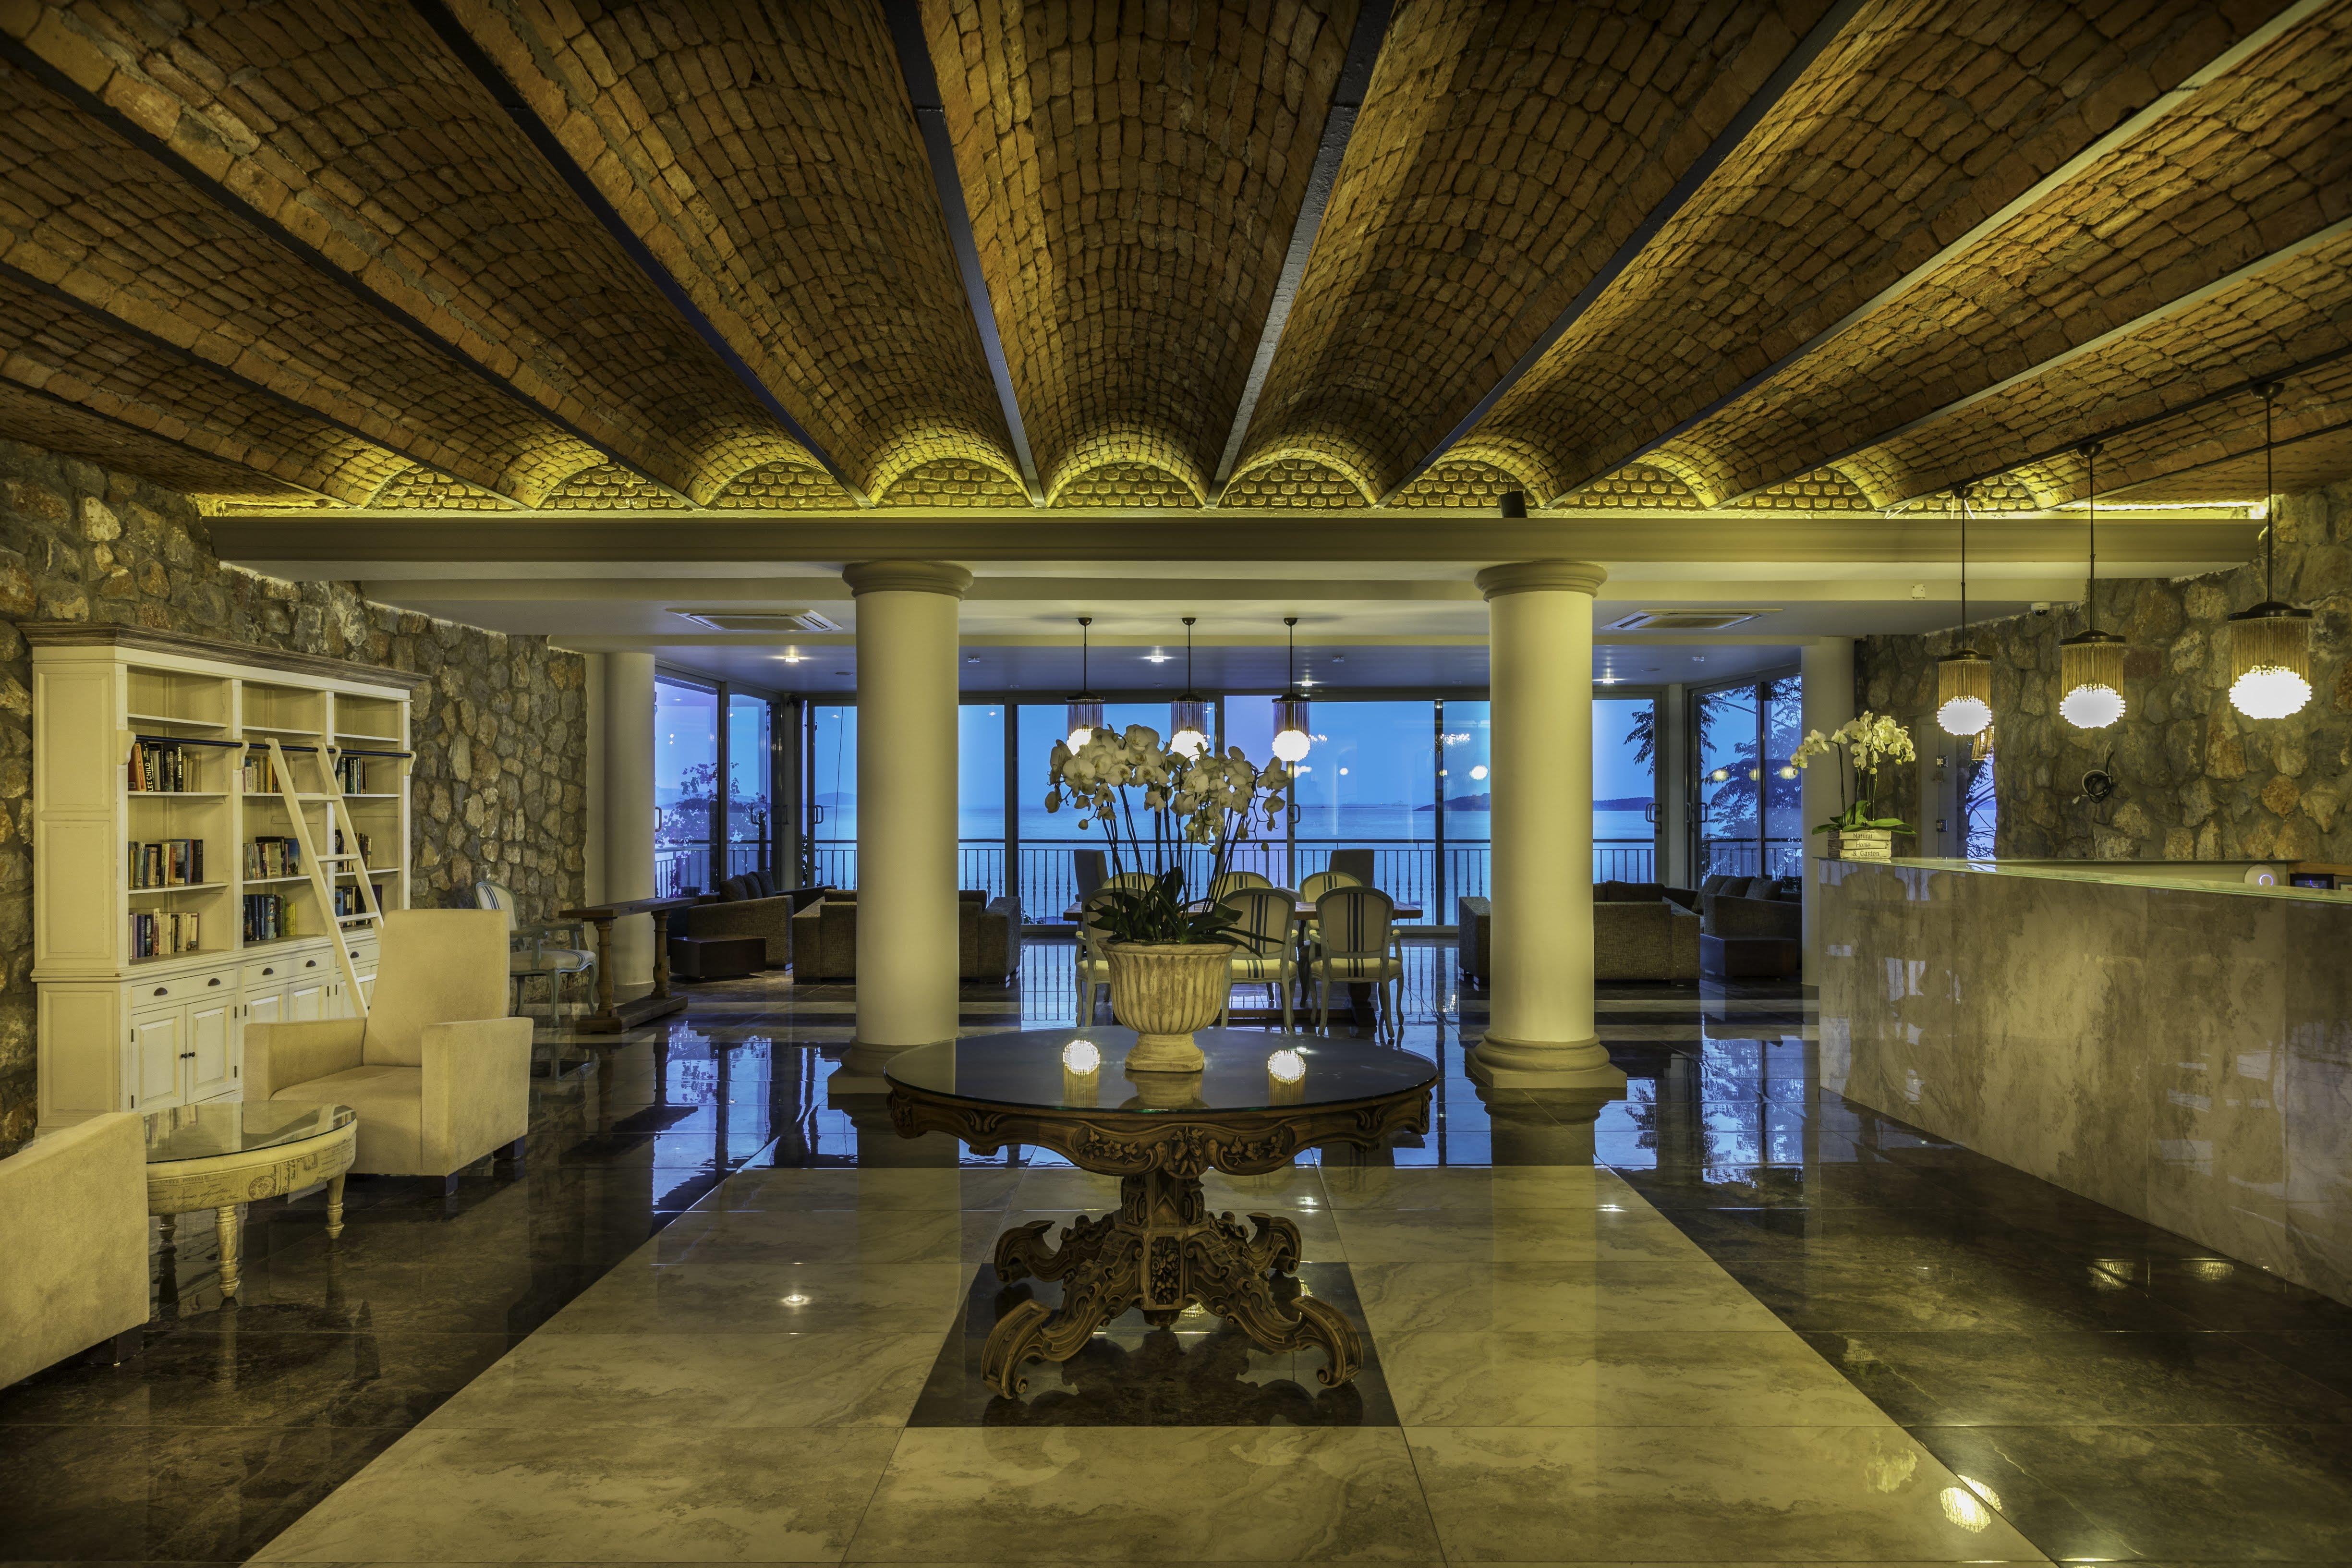 kairaba-blue-dreams-club-hotel-genel-004